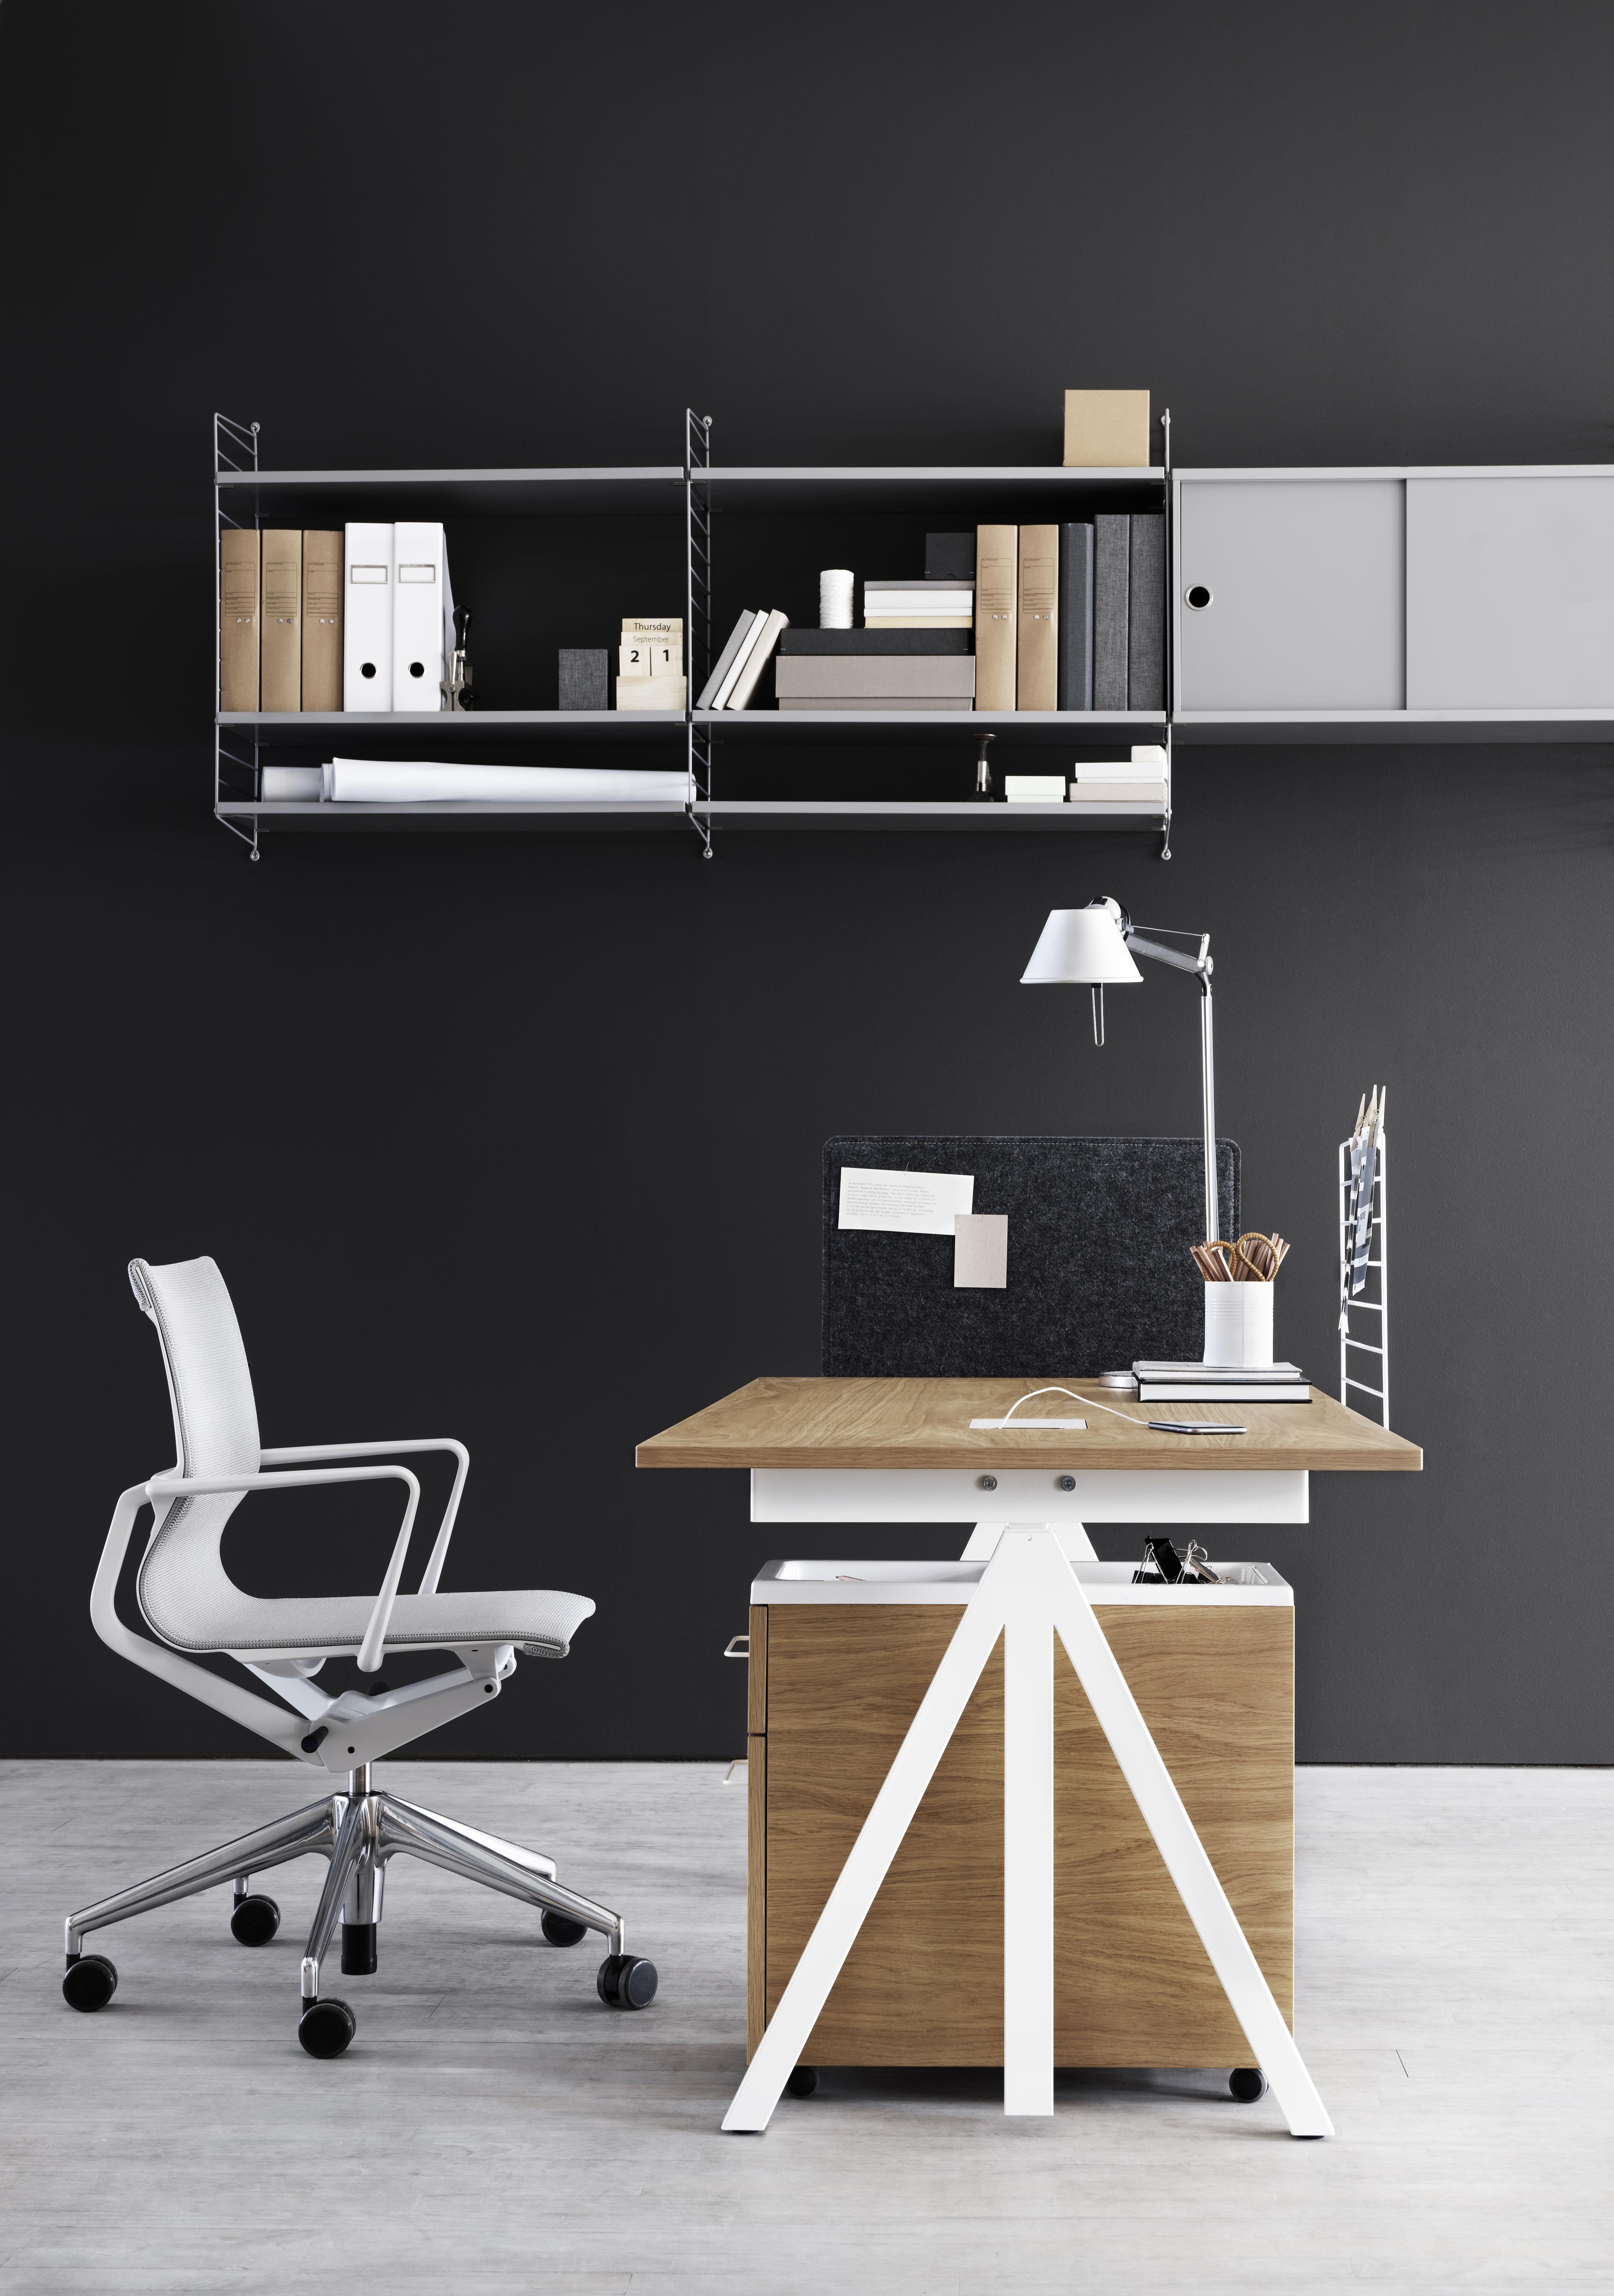 ecran string works pour bureau ecran blanc string furniture. Black Bedroom Furniture Sets. Home Design Ideas